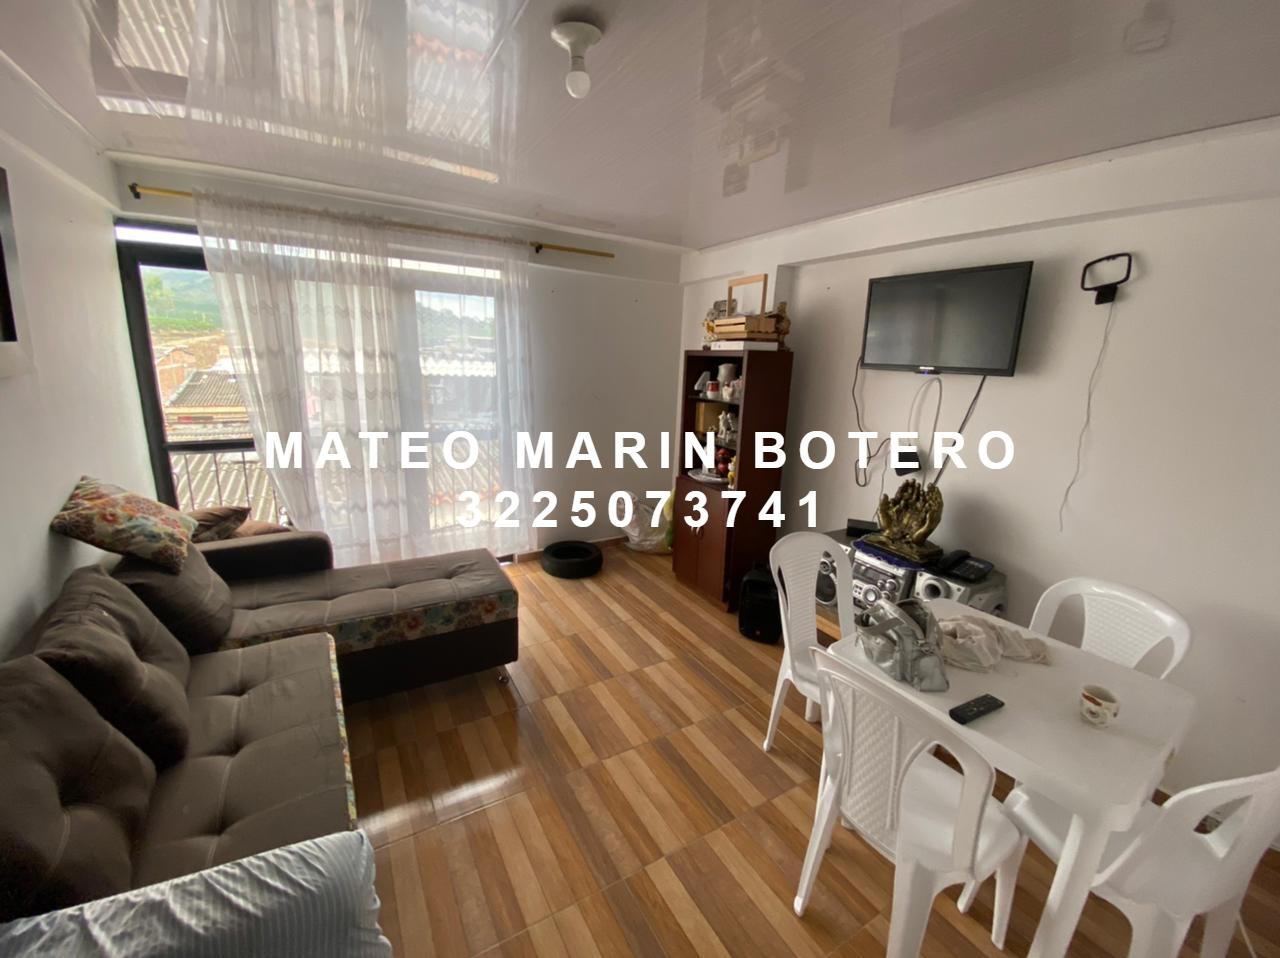 AV-0102 Se vende apartamento en Chinchiná, excelente ubicación.